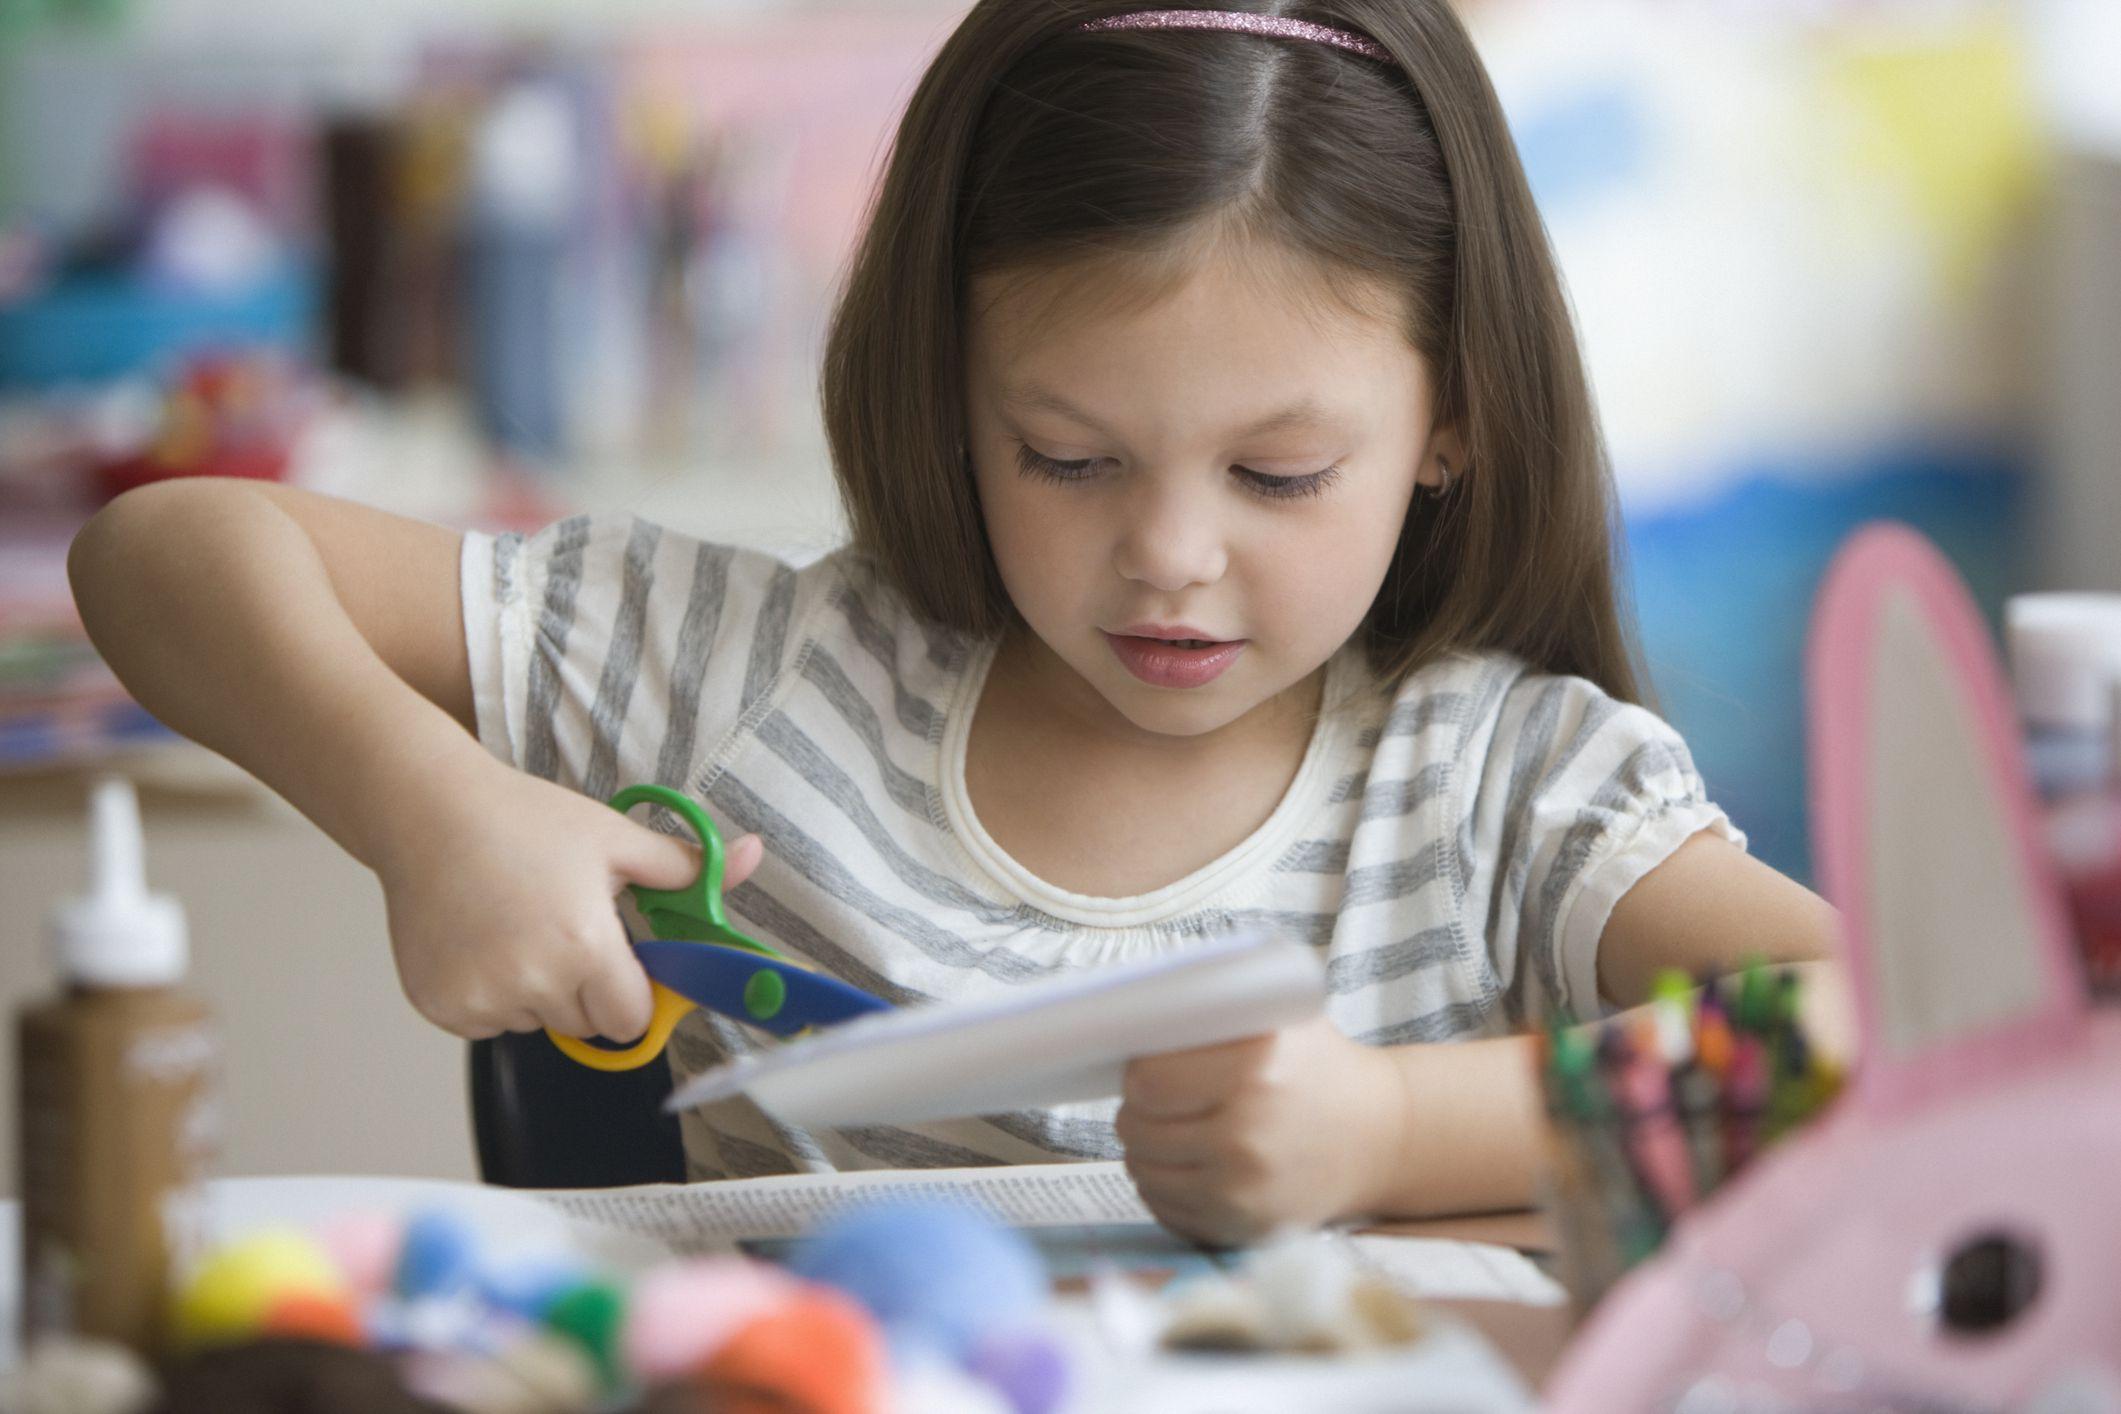 16 Adorable Kids Crafts For Girls